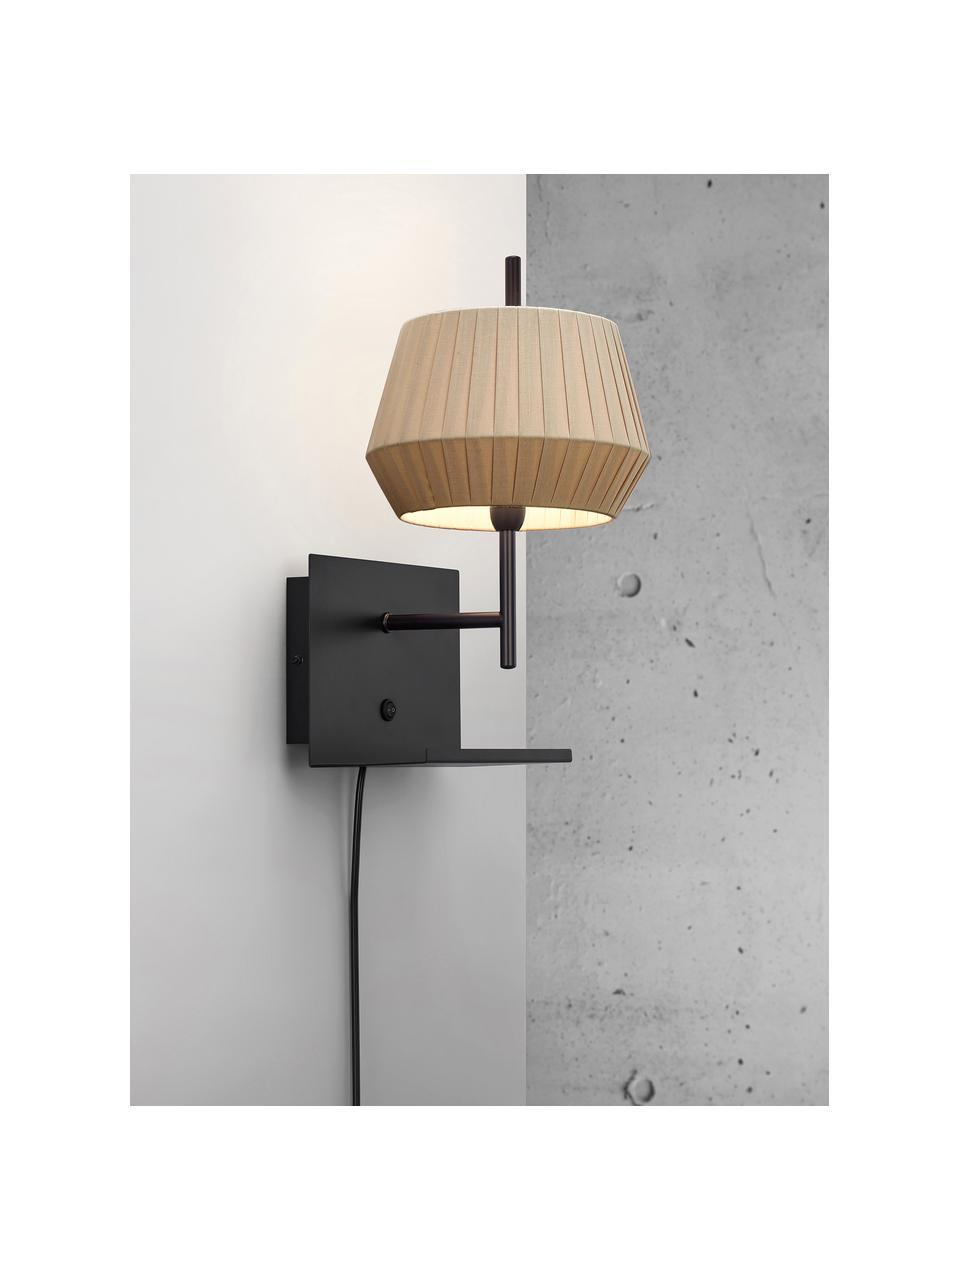 Wandlamp Dicte met stekker, Lampenkap: stof, Beige, zwart, 21 x 38 cm